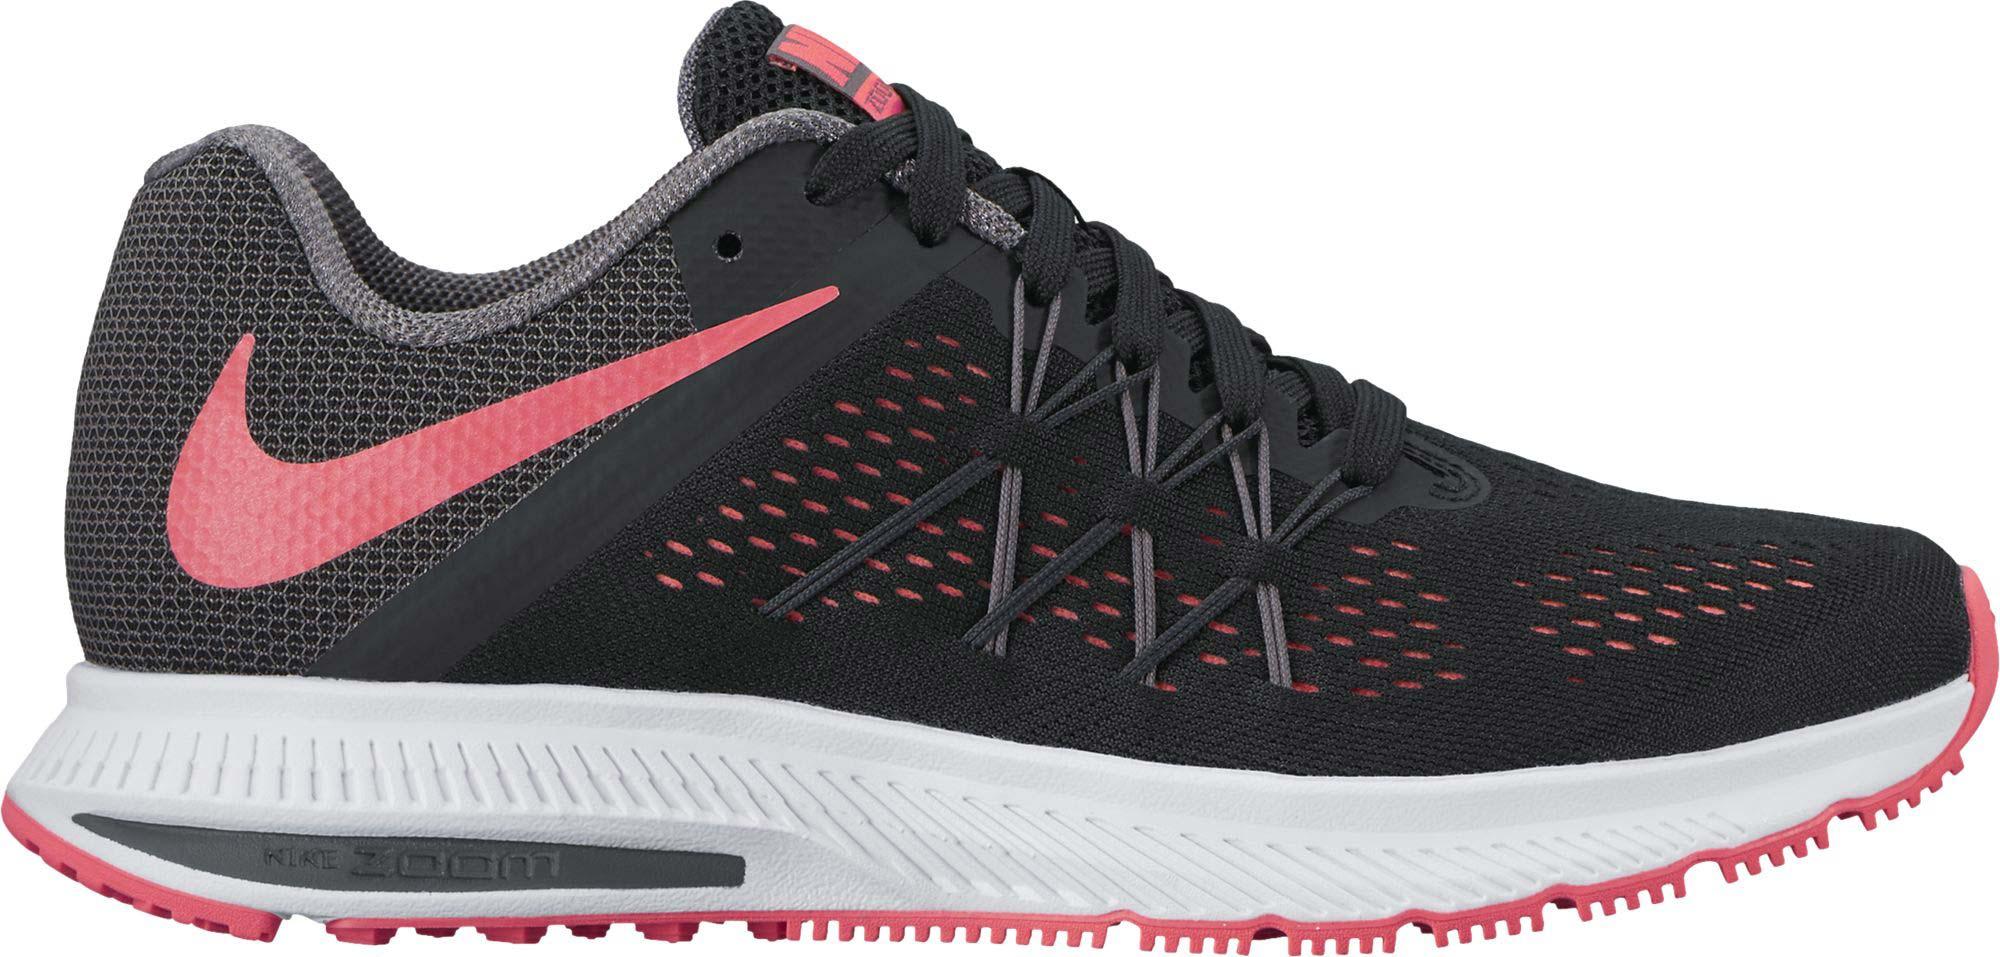 Nike Air Zoom Winflo 3 Shield SKU:8753750